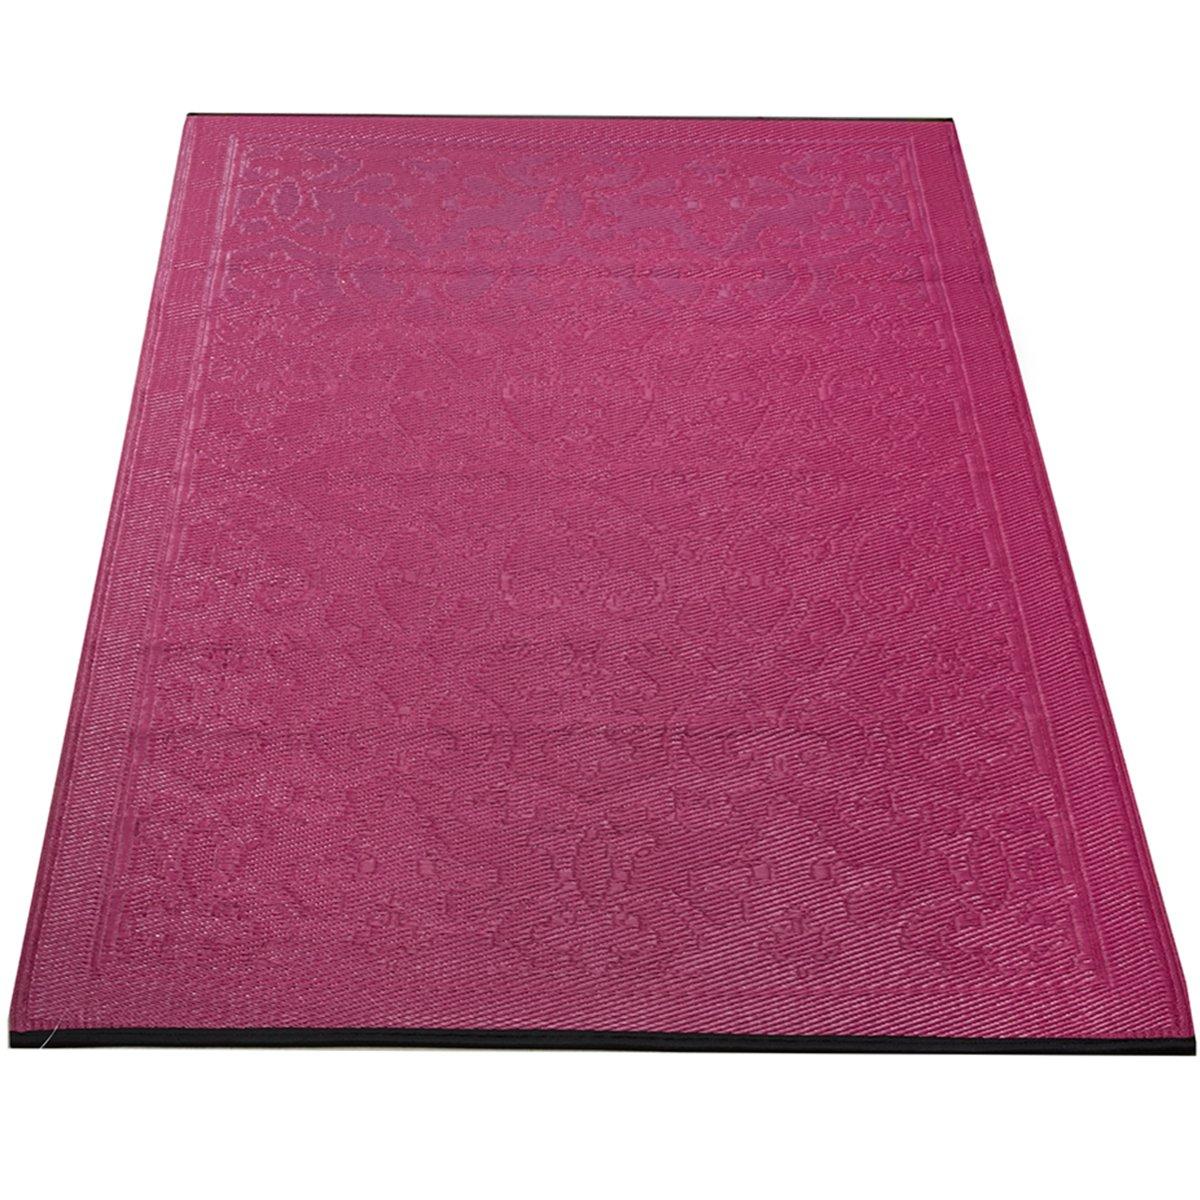 Yankee Trader 4' X 6' Indoor/Outdoor Decorative Reversible Patio Carpet Rug, Pattern 10